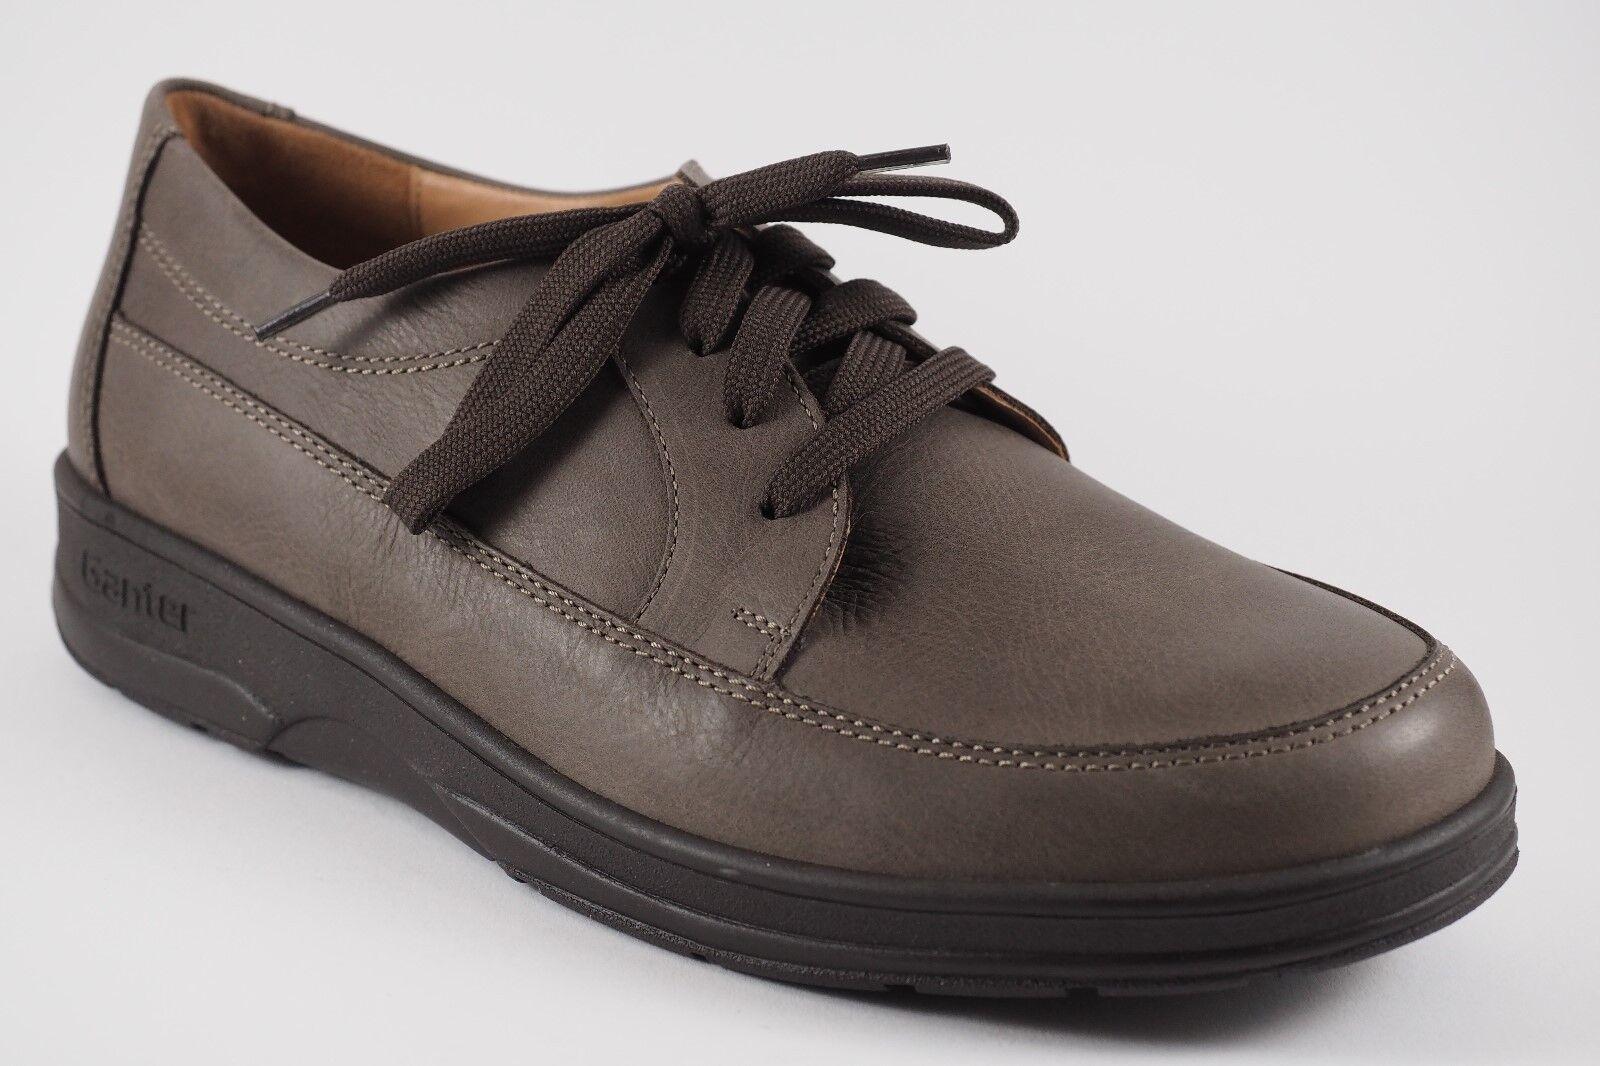 Ganter men Lacci da shoes 7,5 H 41 1 2 Basse pelle brown grey Inserto